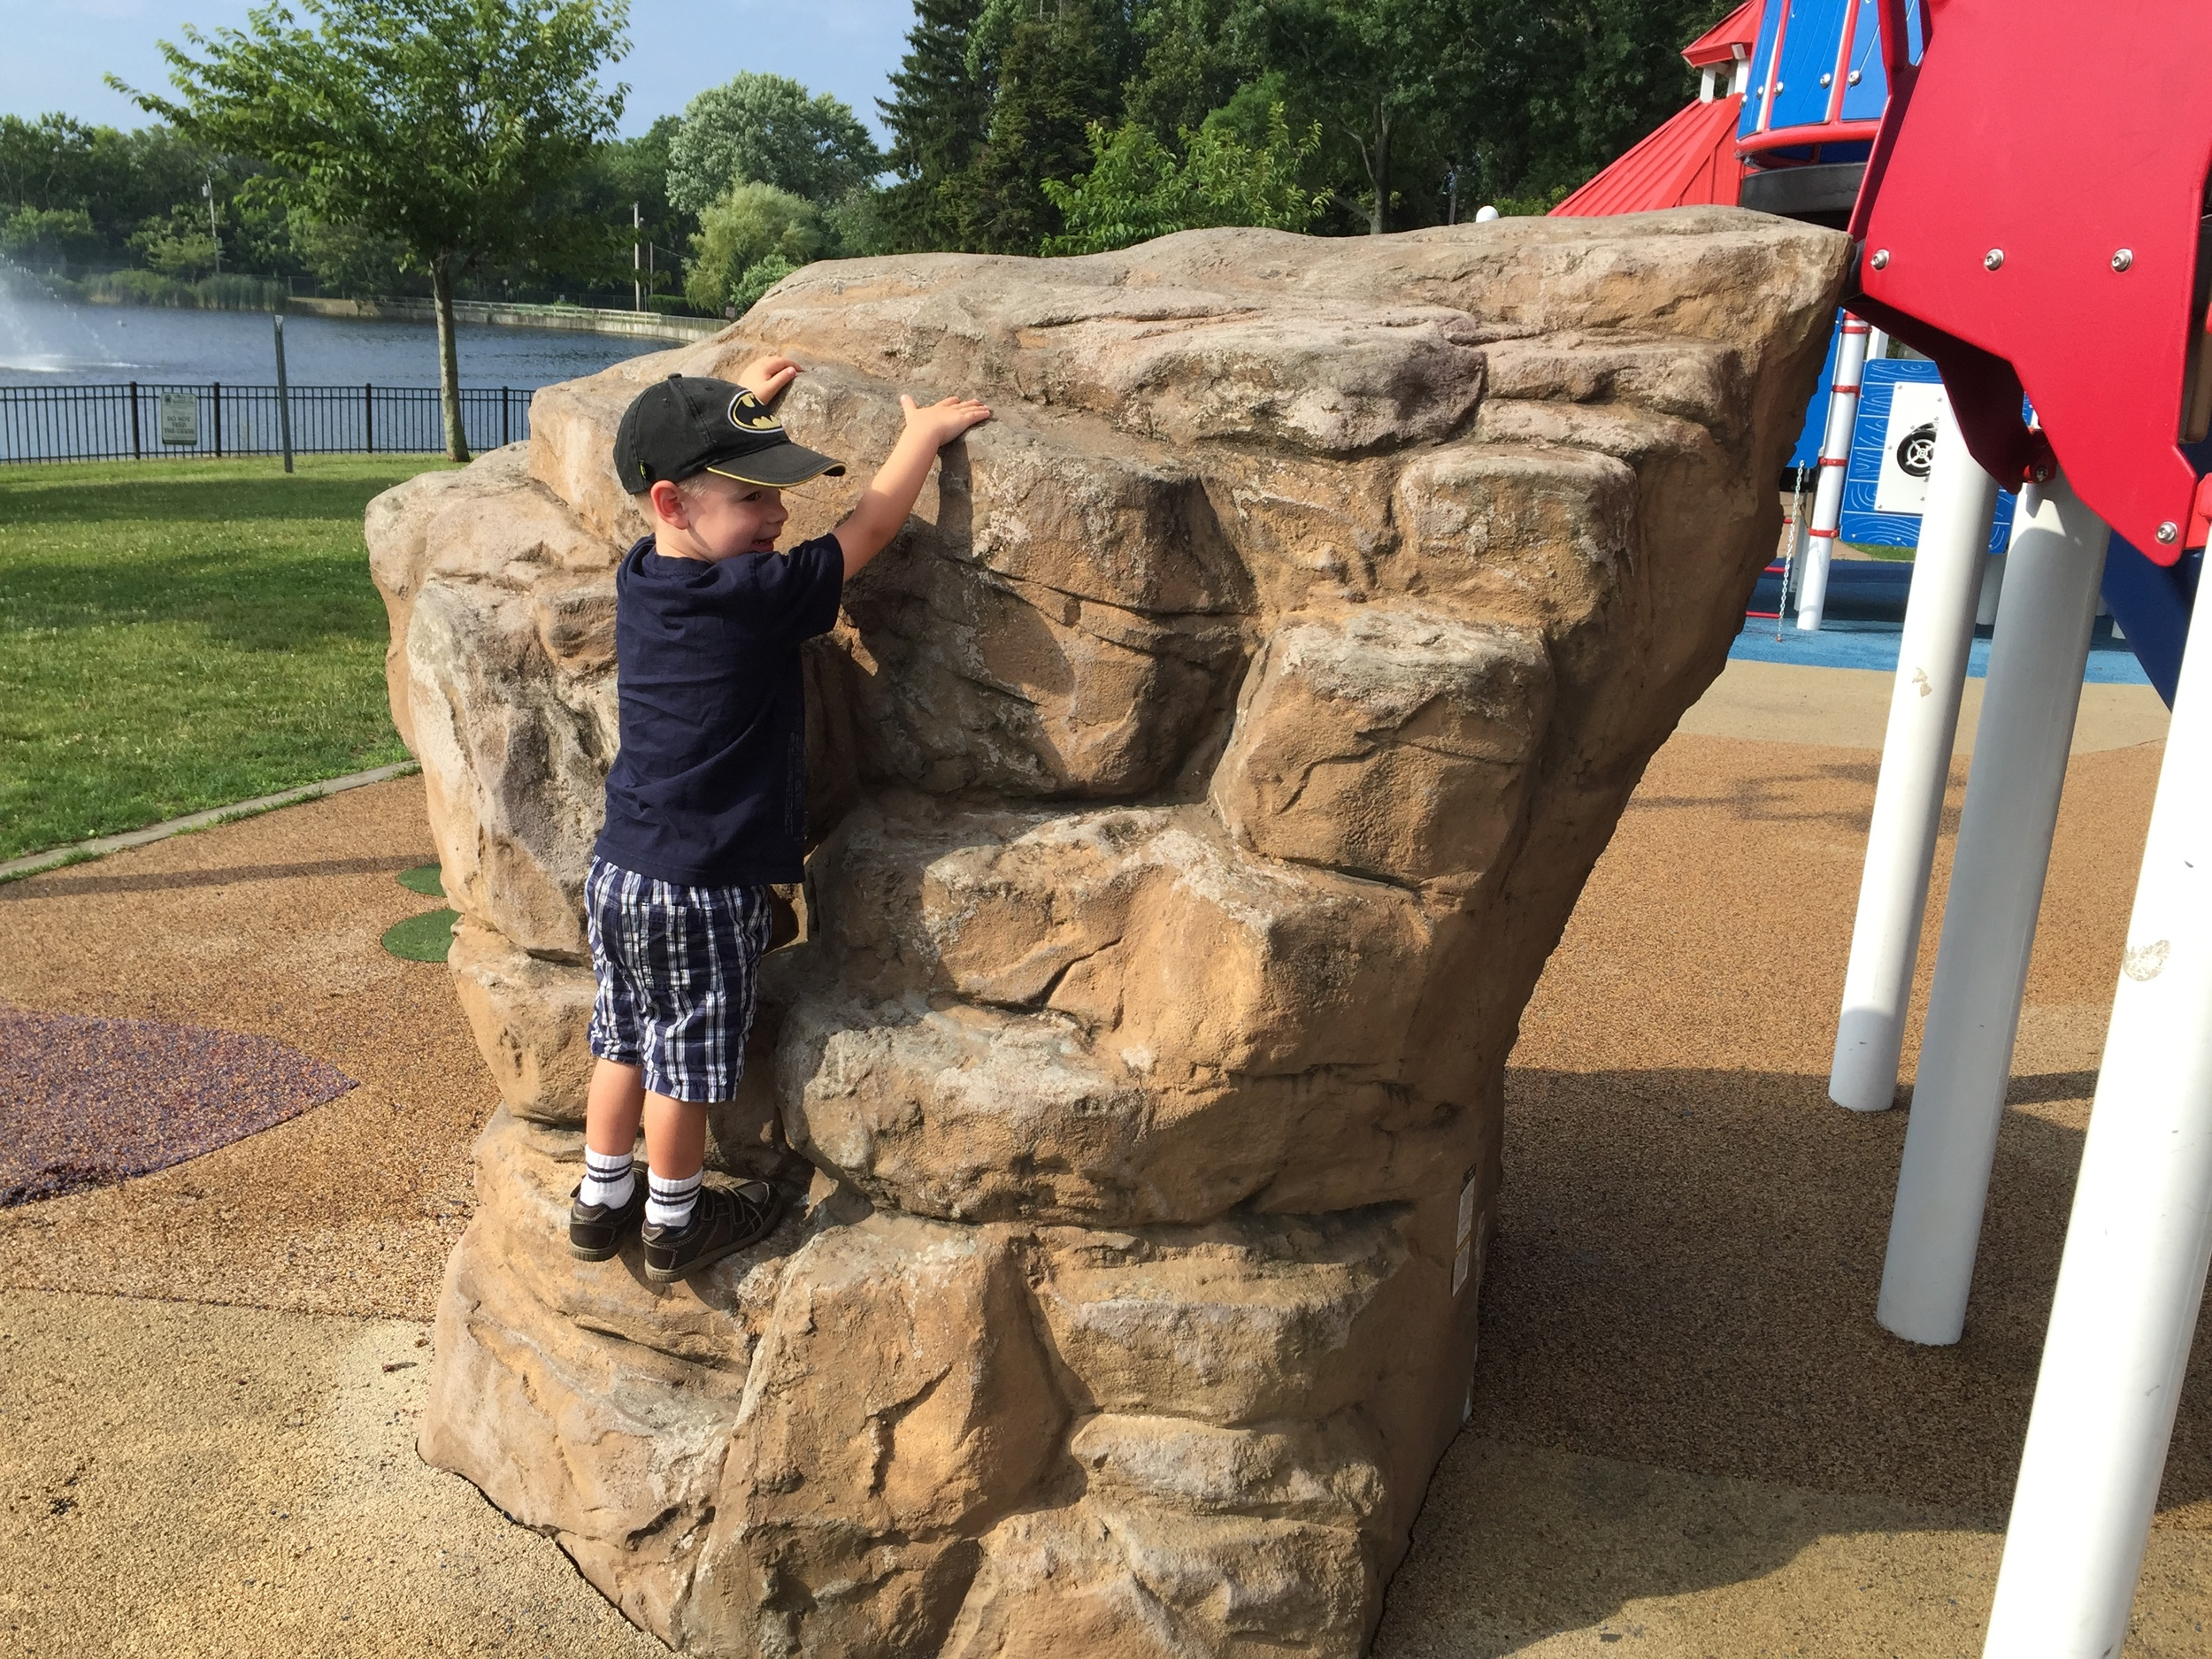 Rock climb at Phelps Lane Park